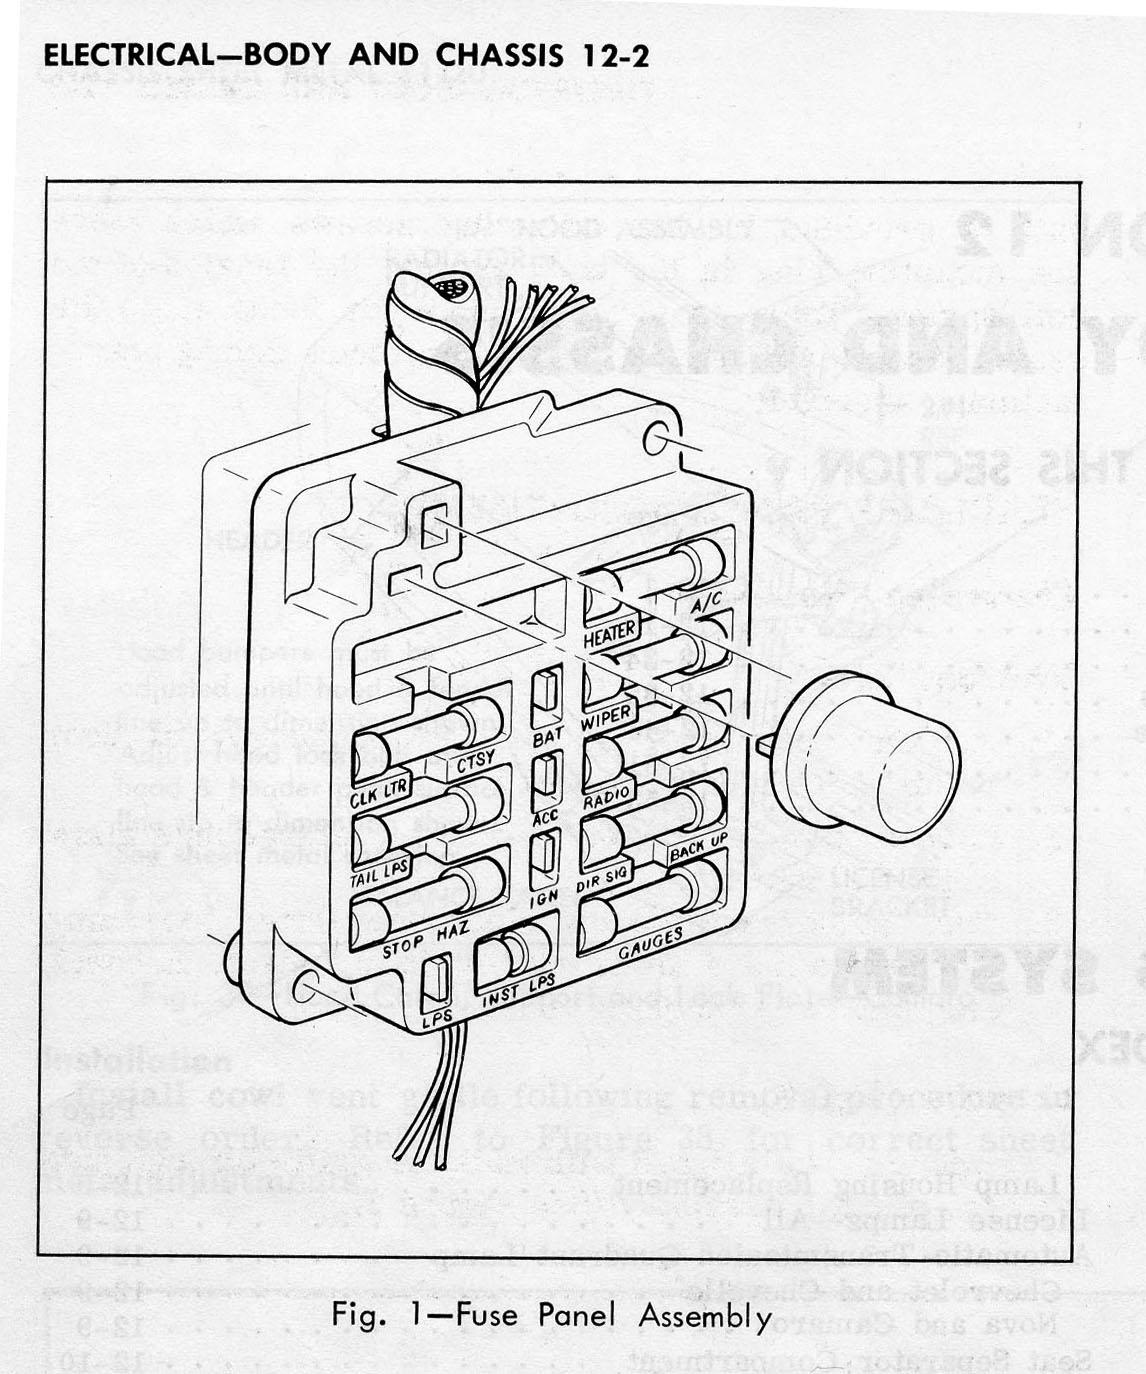 1981 corvette fuse panel box diagram